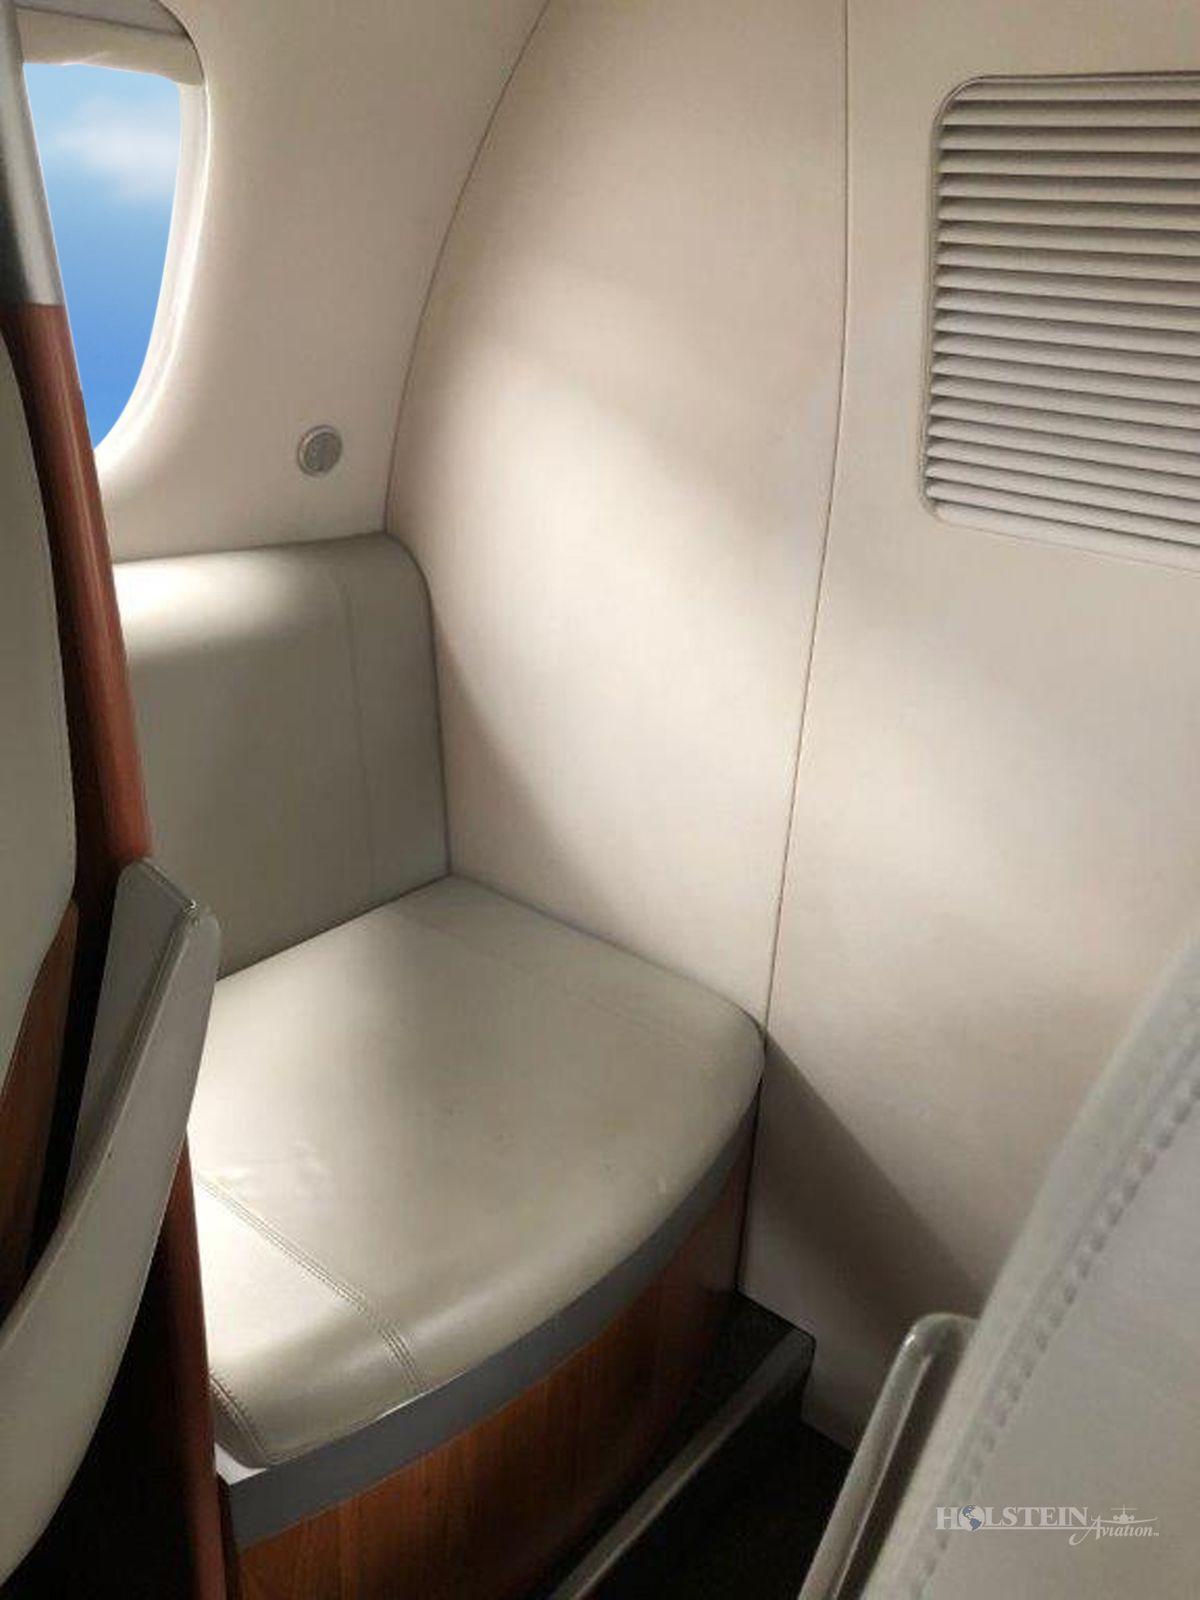 2011 Embraer Phenom 100 - SN 50000237 - VH-FJP - Int - Lav RGB.jpg